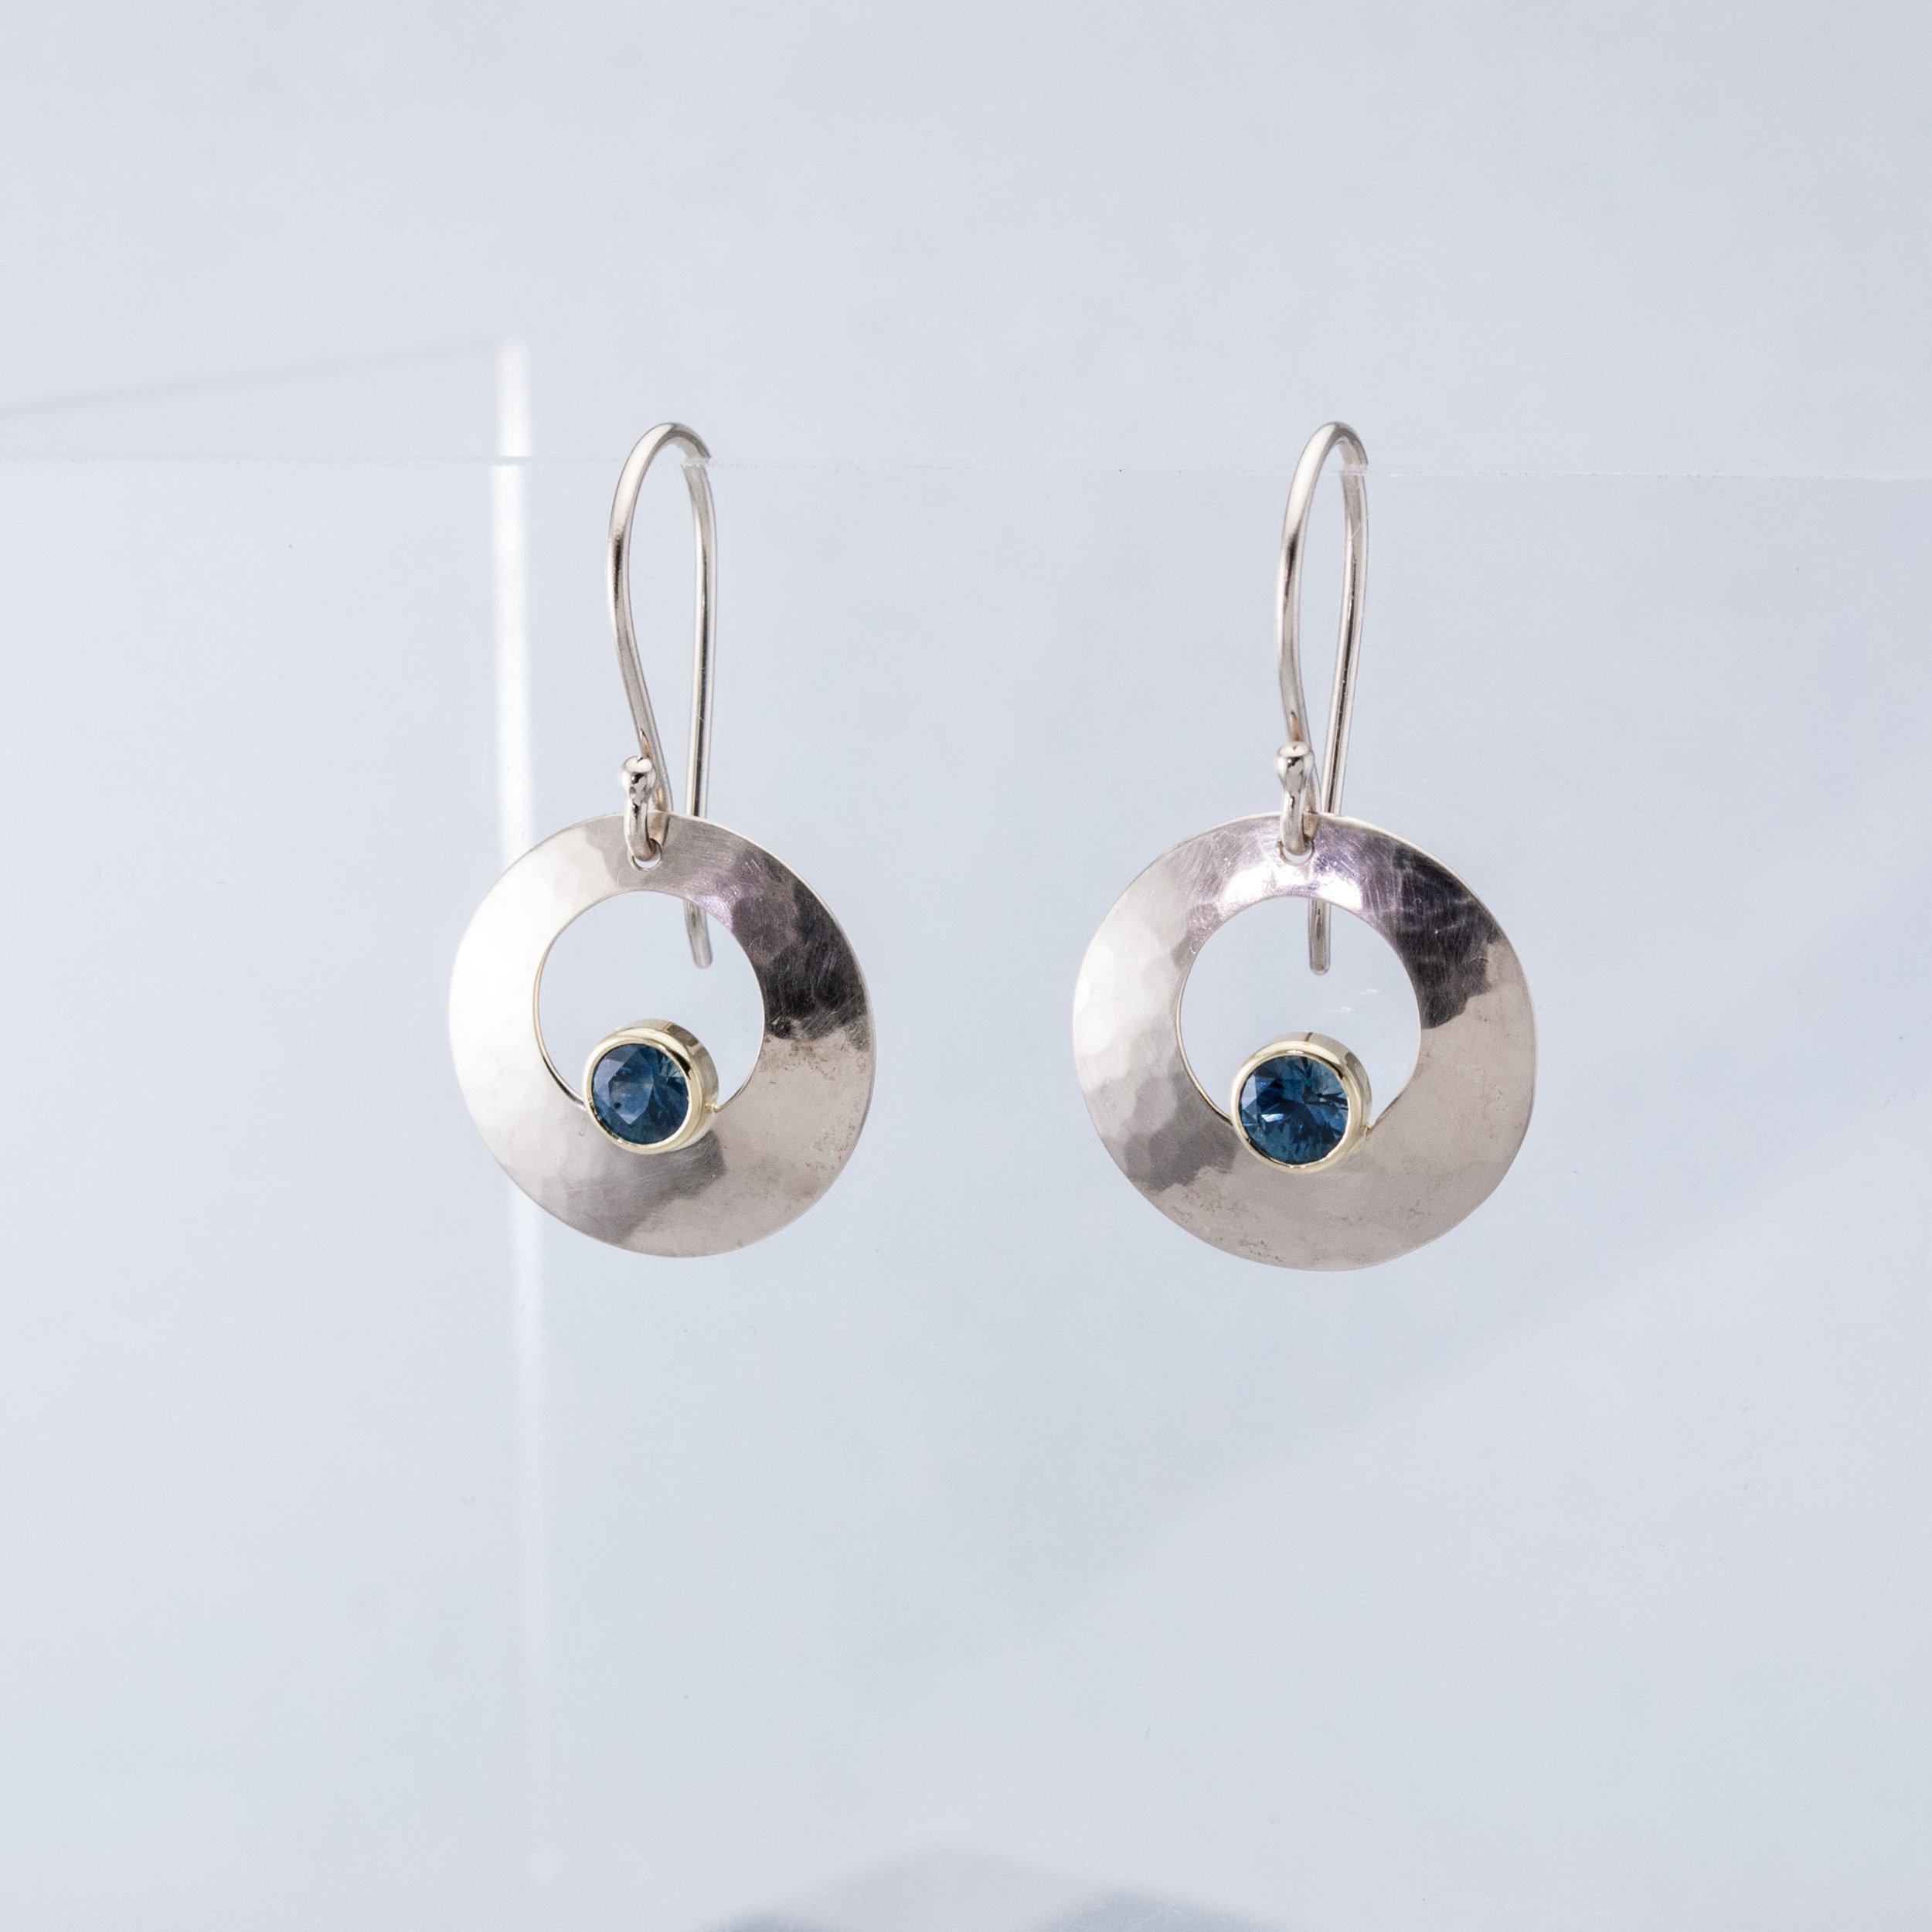 Luna Earrings with Montana Sapphires